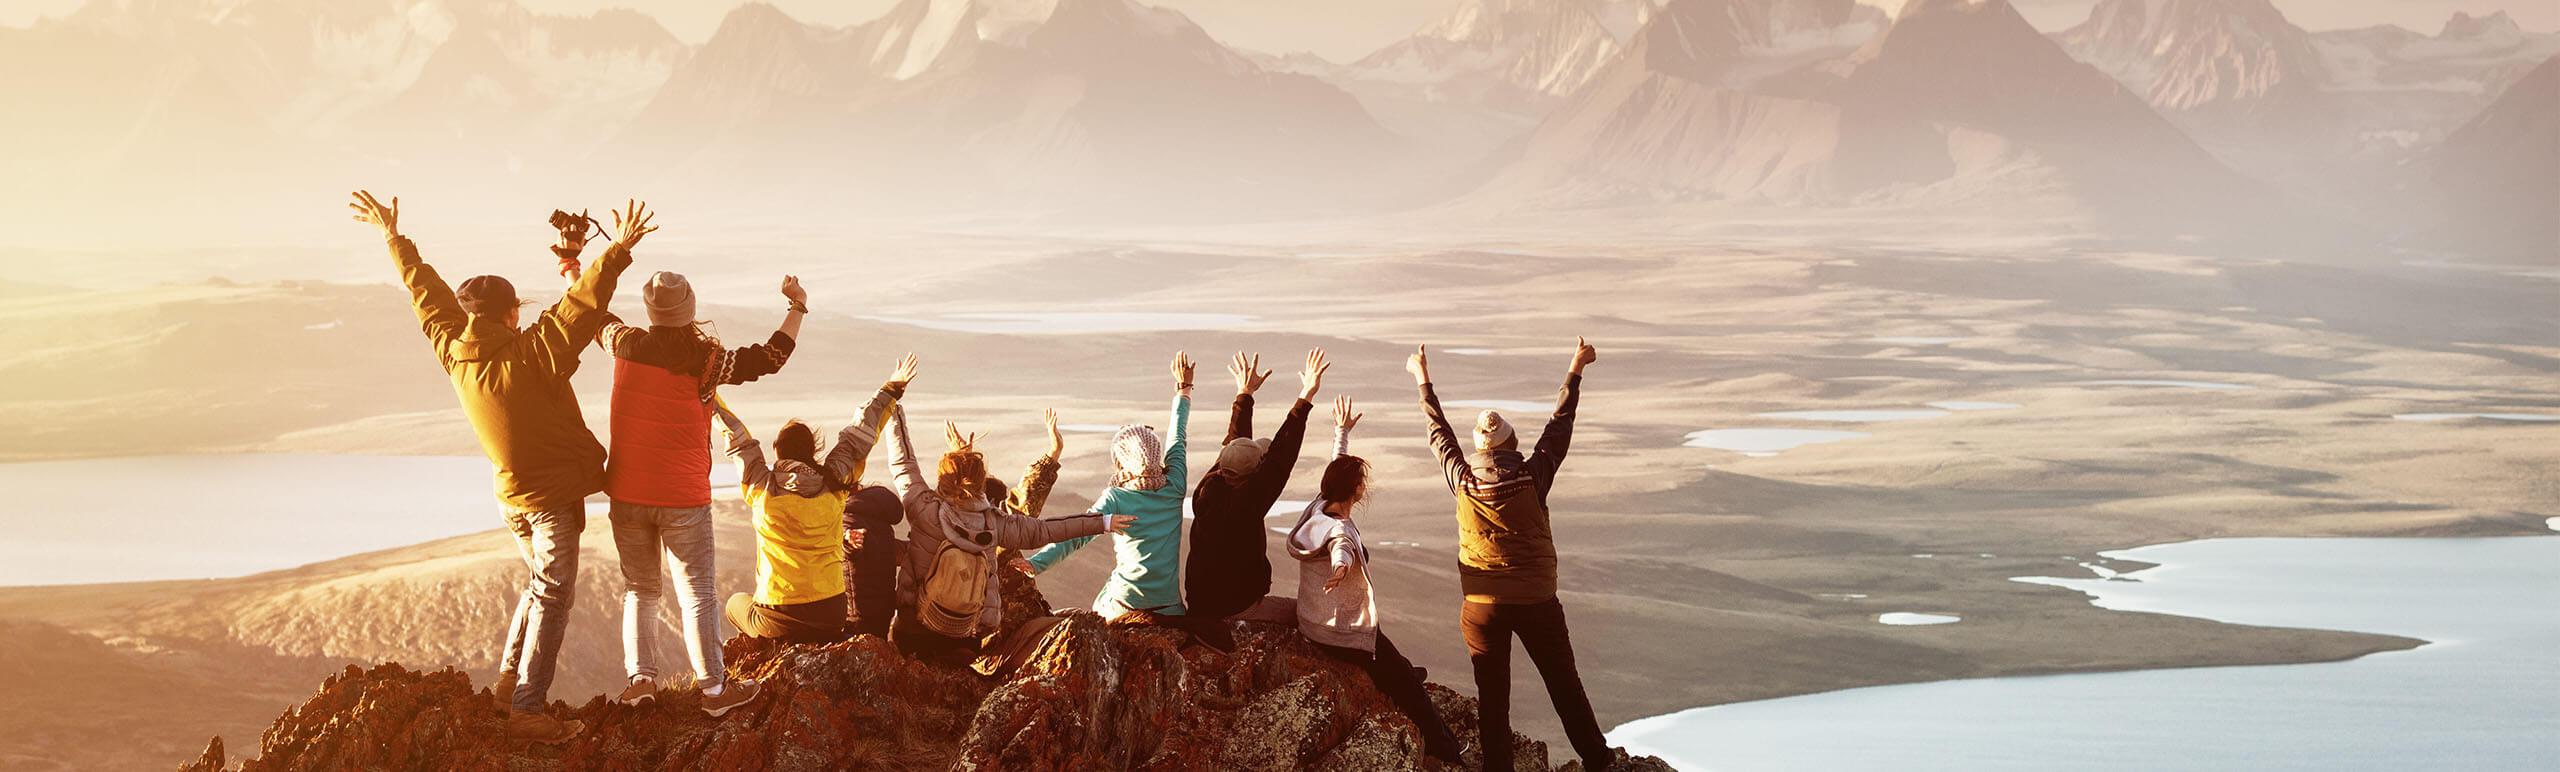 Social Media Marketing Erfolge feiern und genießen